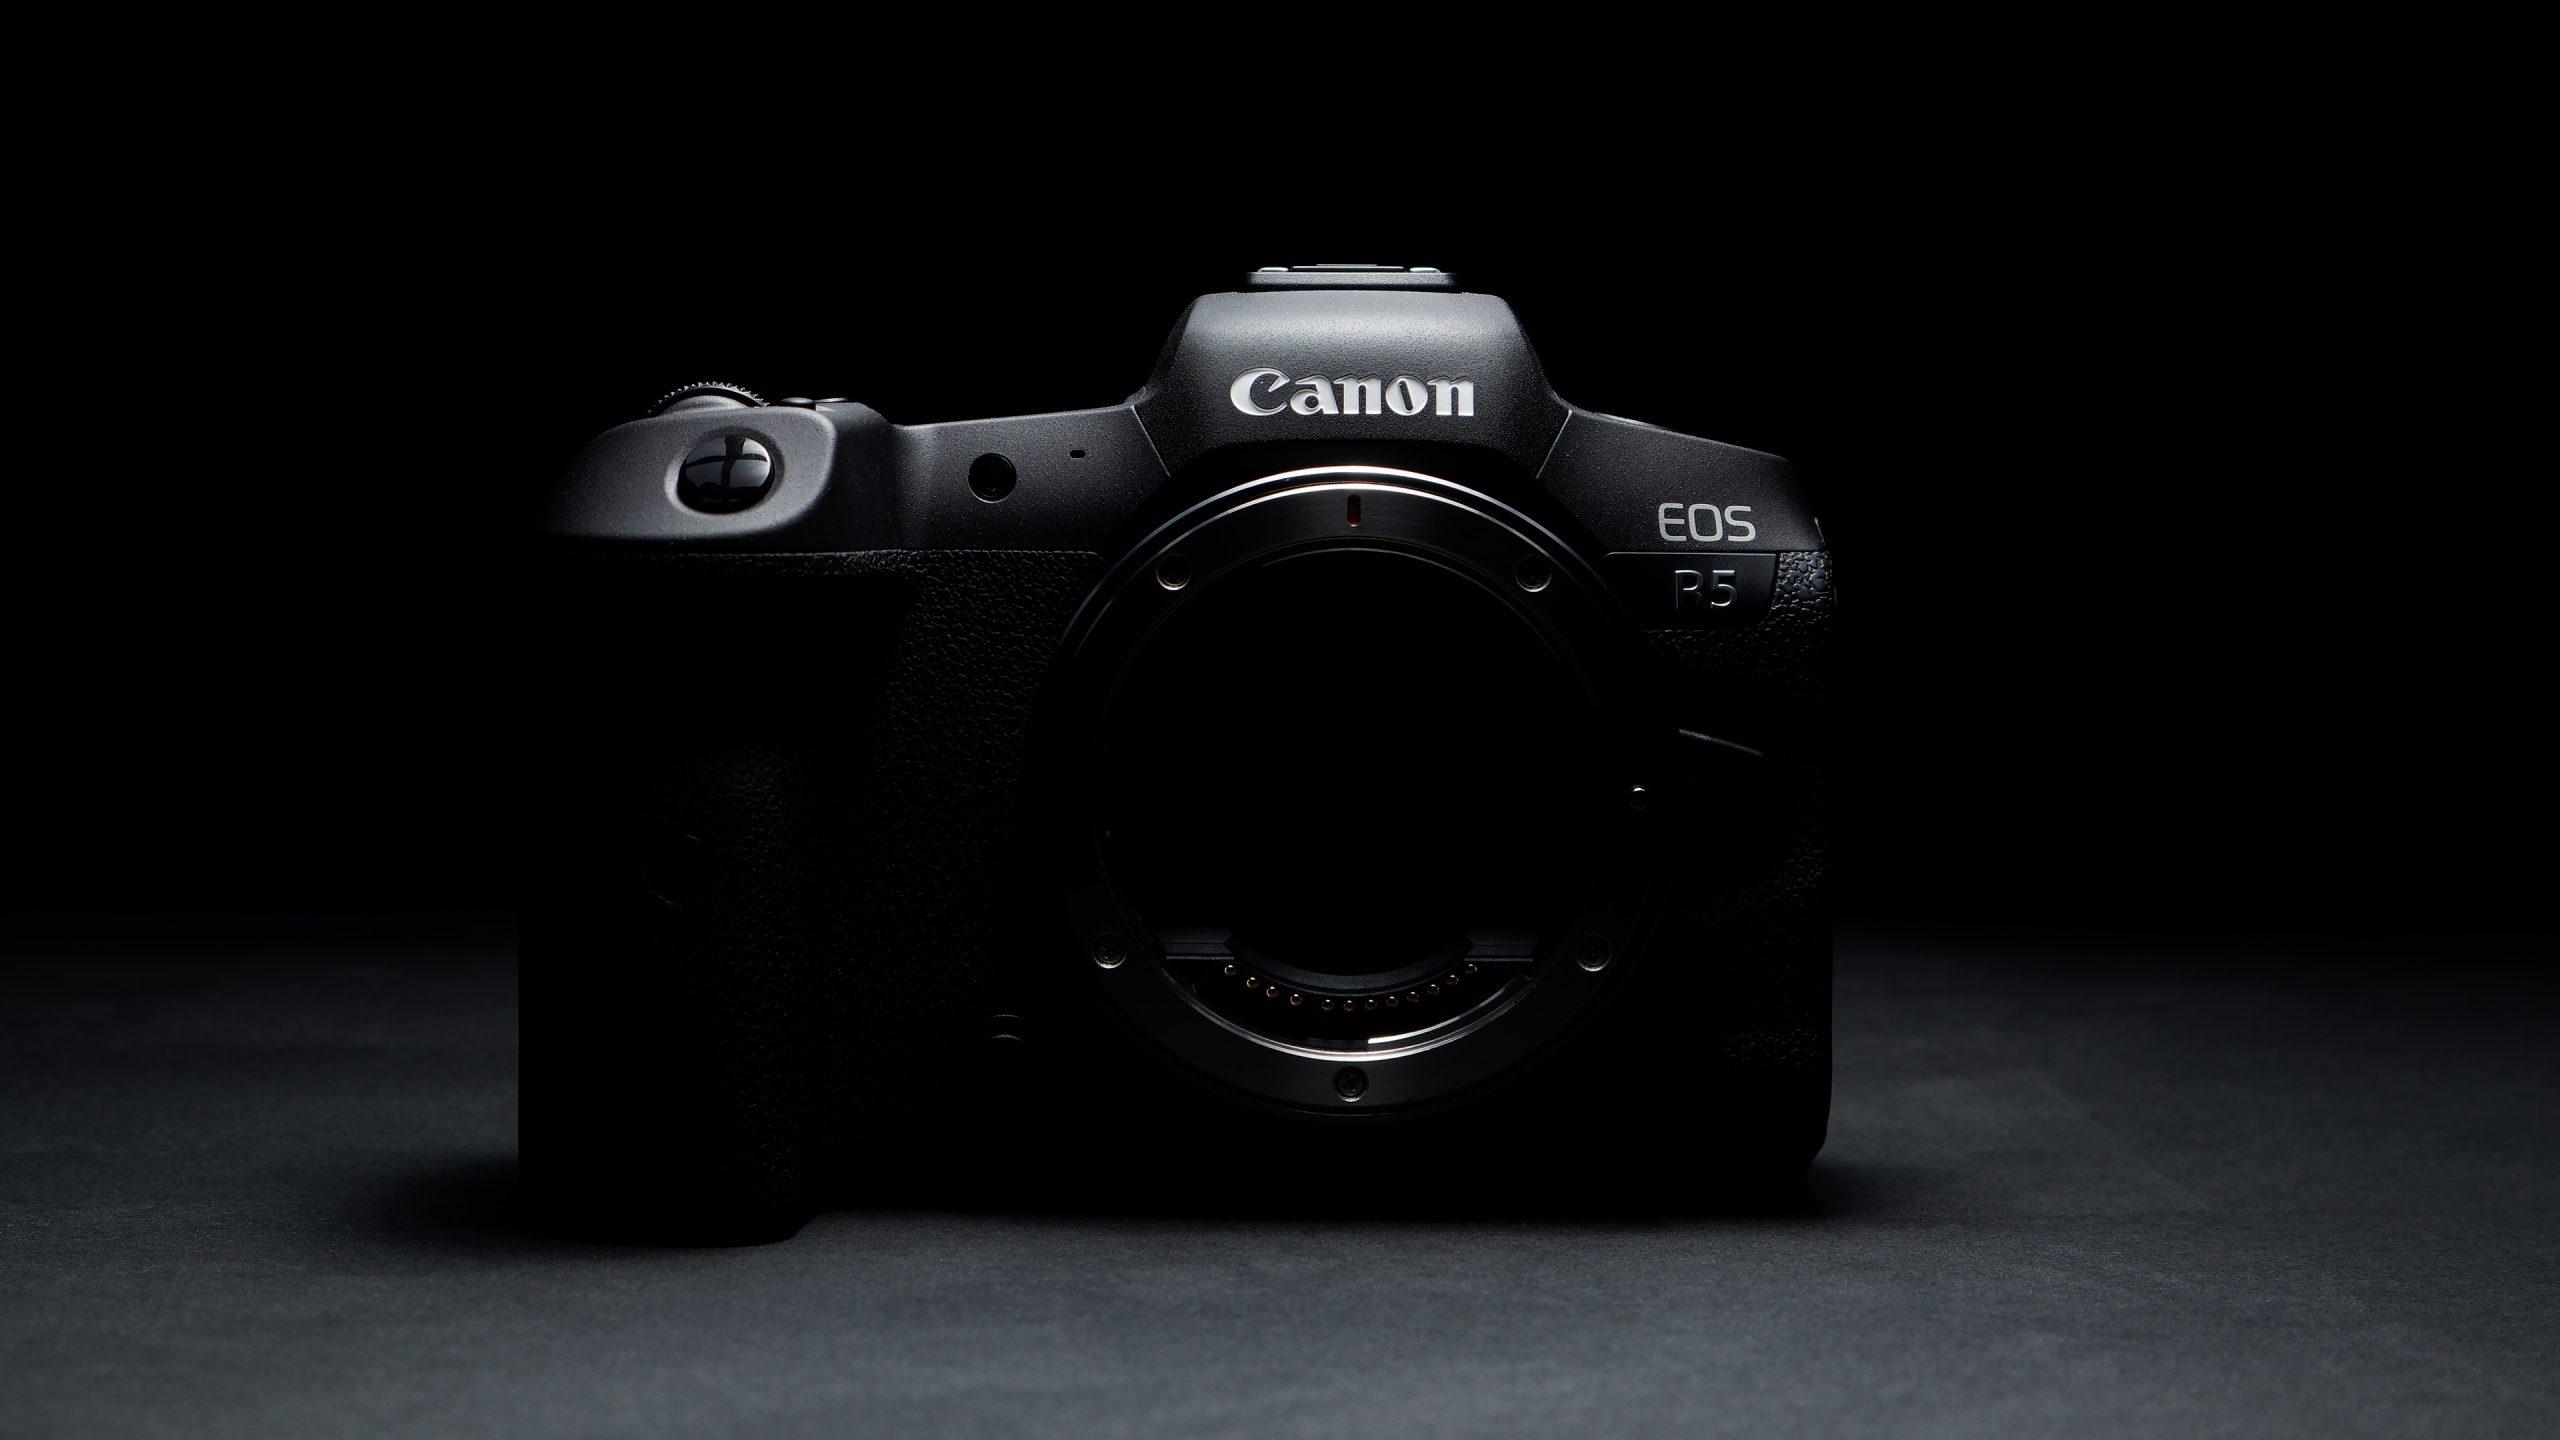 eosr5 canon r5 canonnordic canonsuomi kamera valokuvaaja